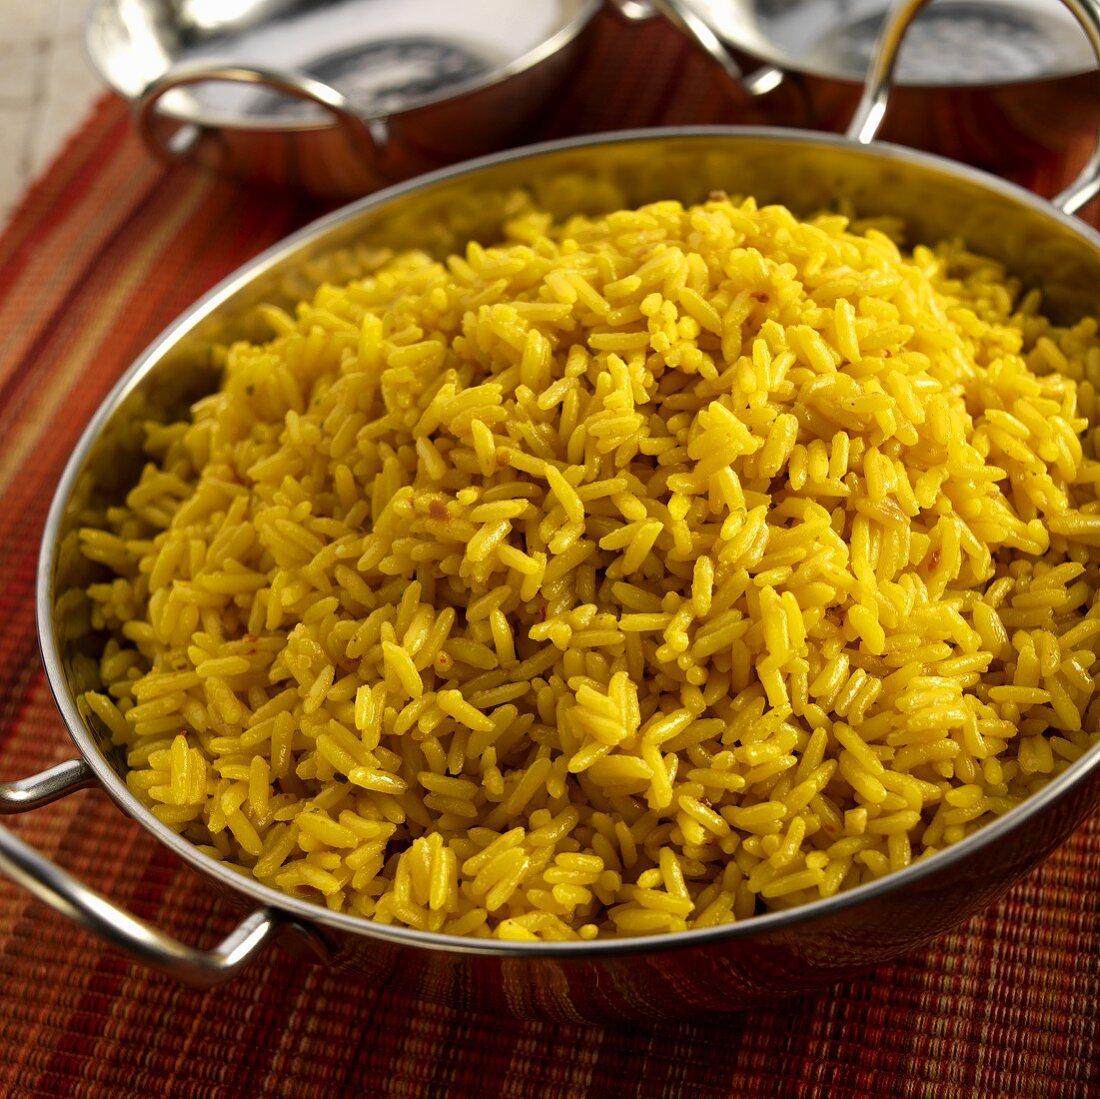 A Bowl of Spanish Yellow Rice (Arroz Amarillo)